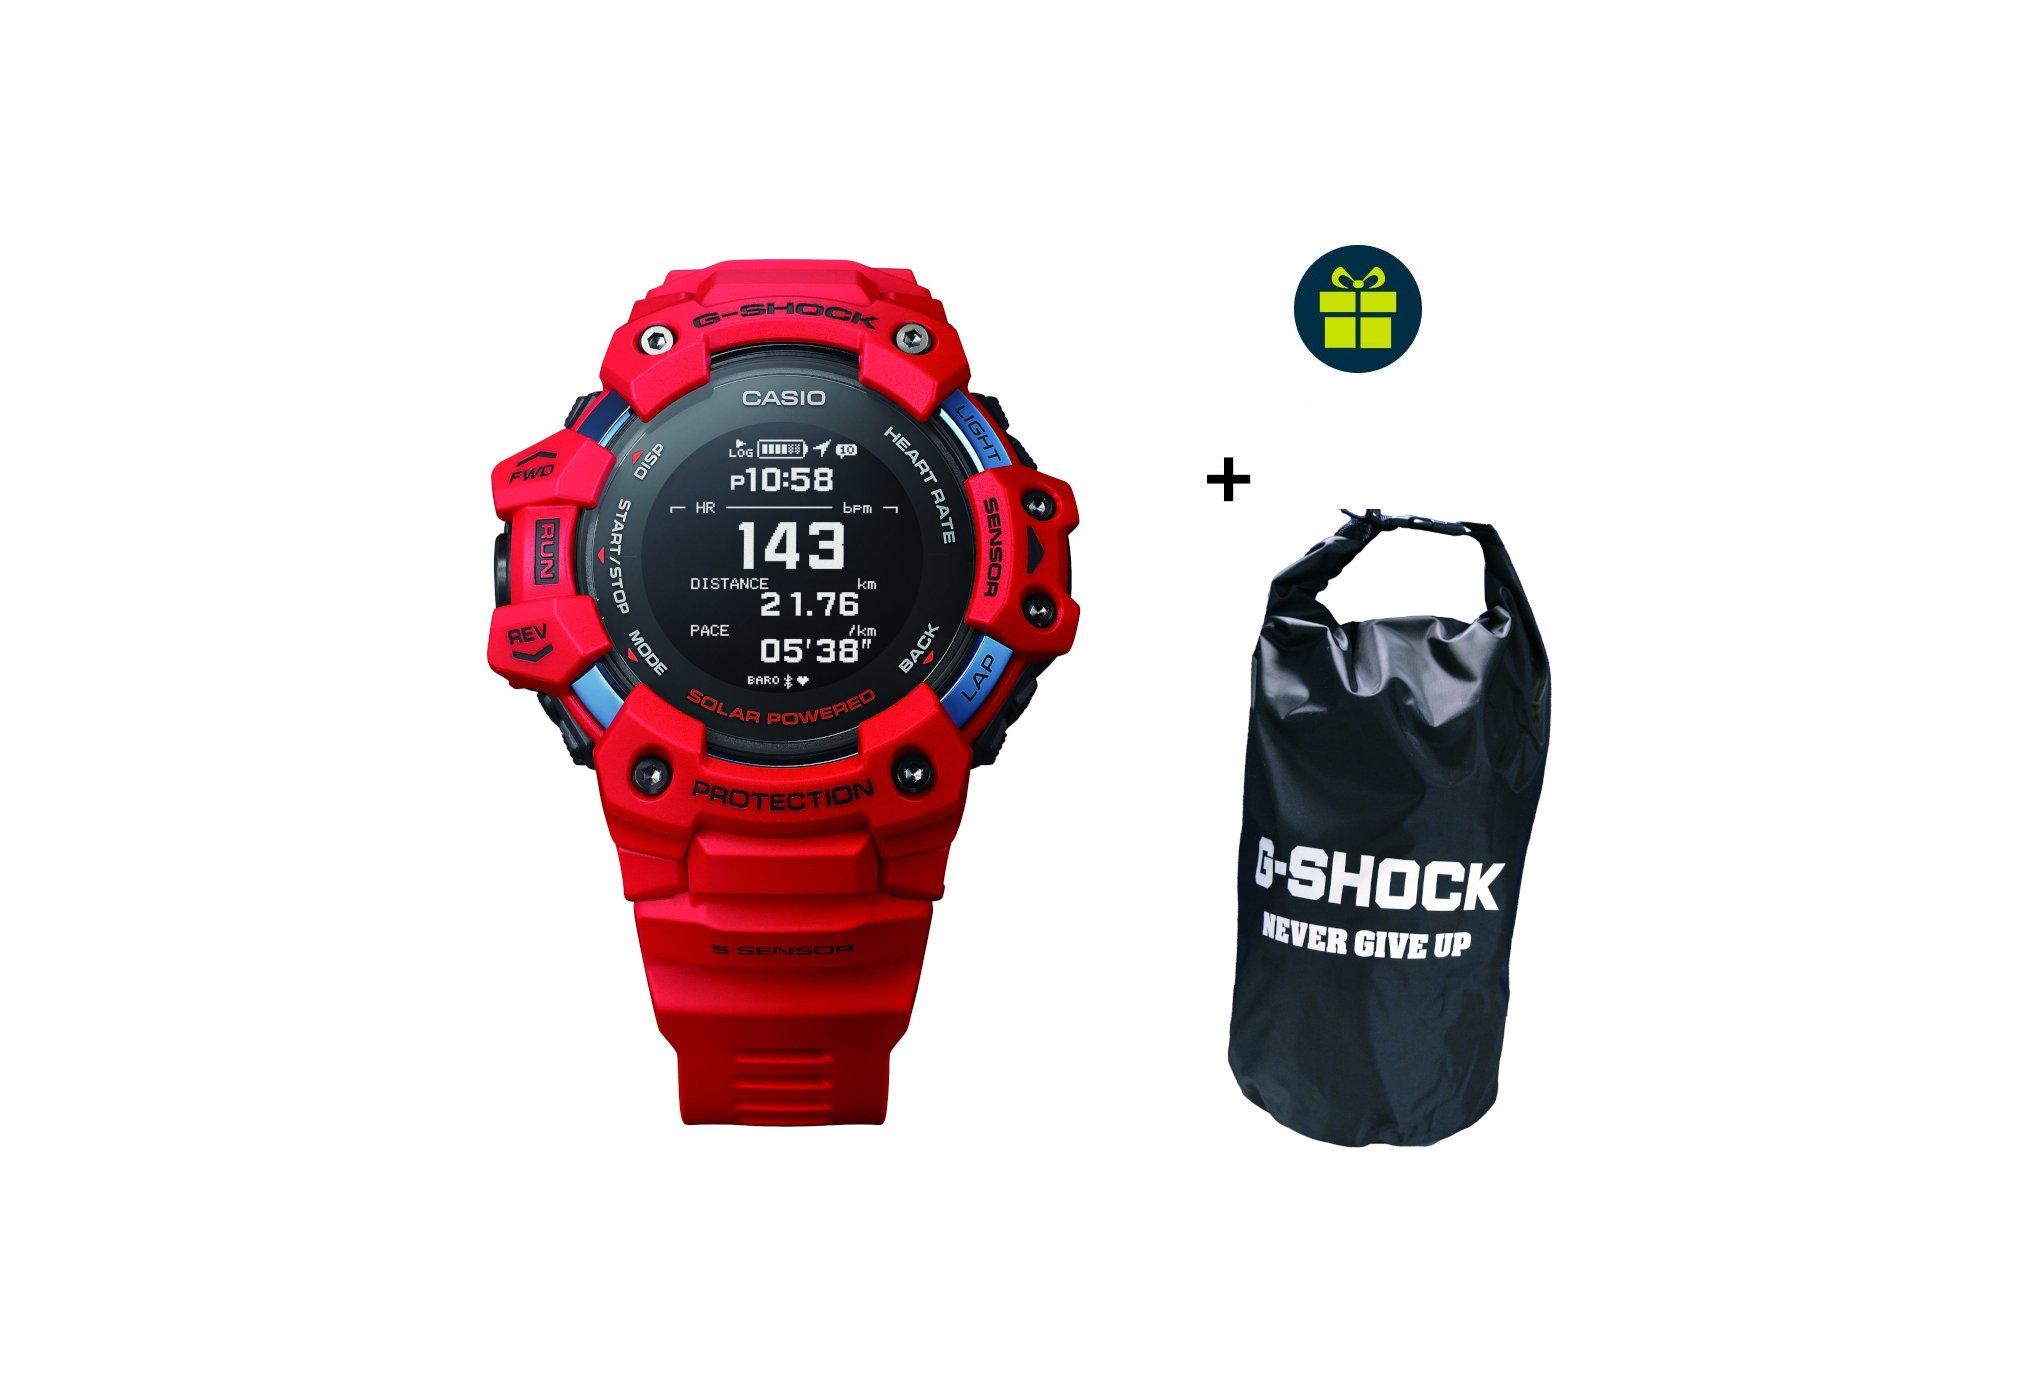 Casio G-SQUAD HR GBD-H1000-4ER et sac étanche G-Shock offert Cardio-Gps